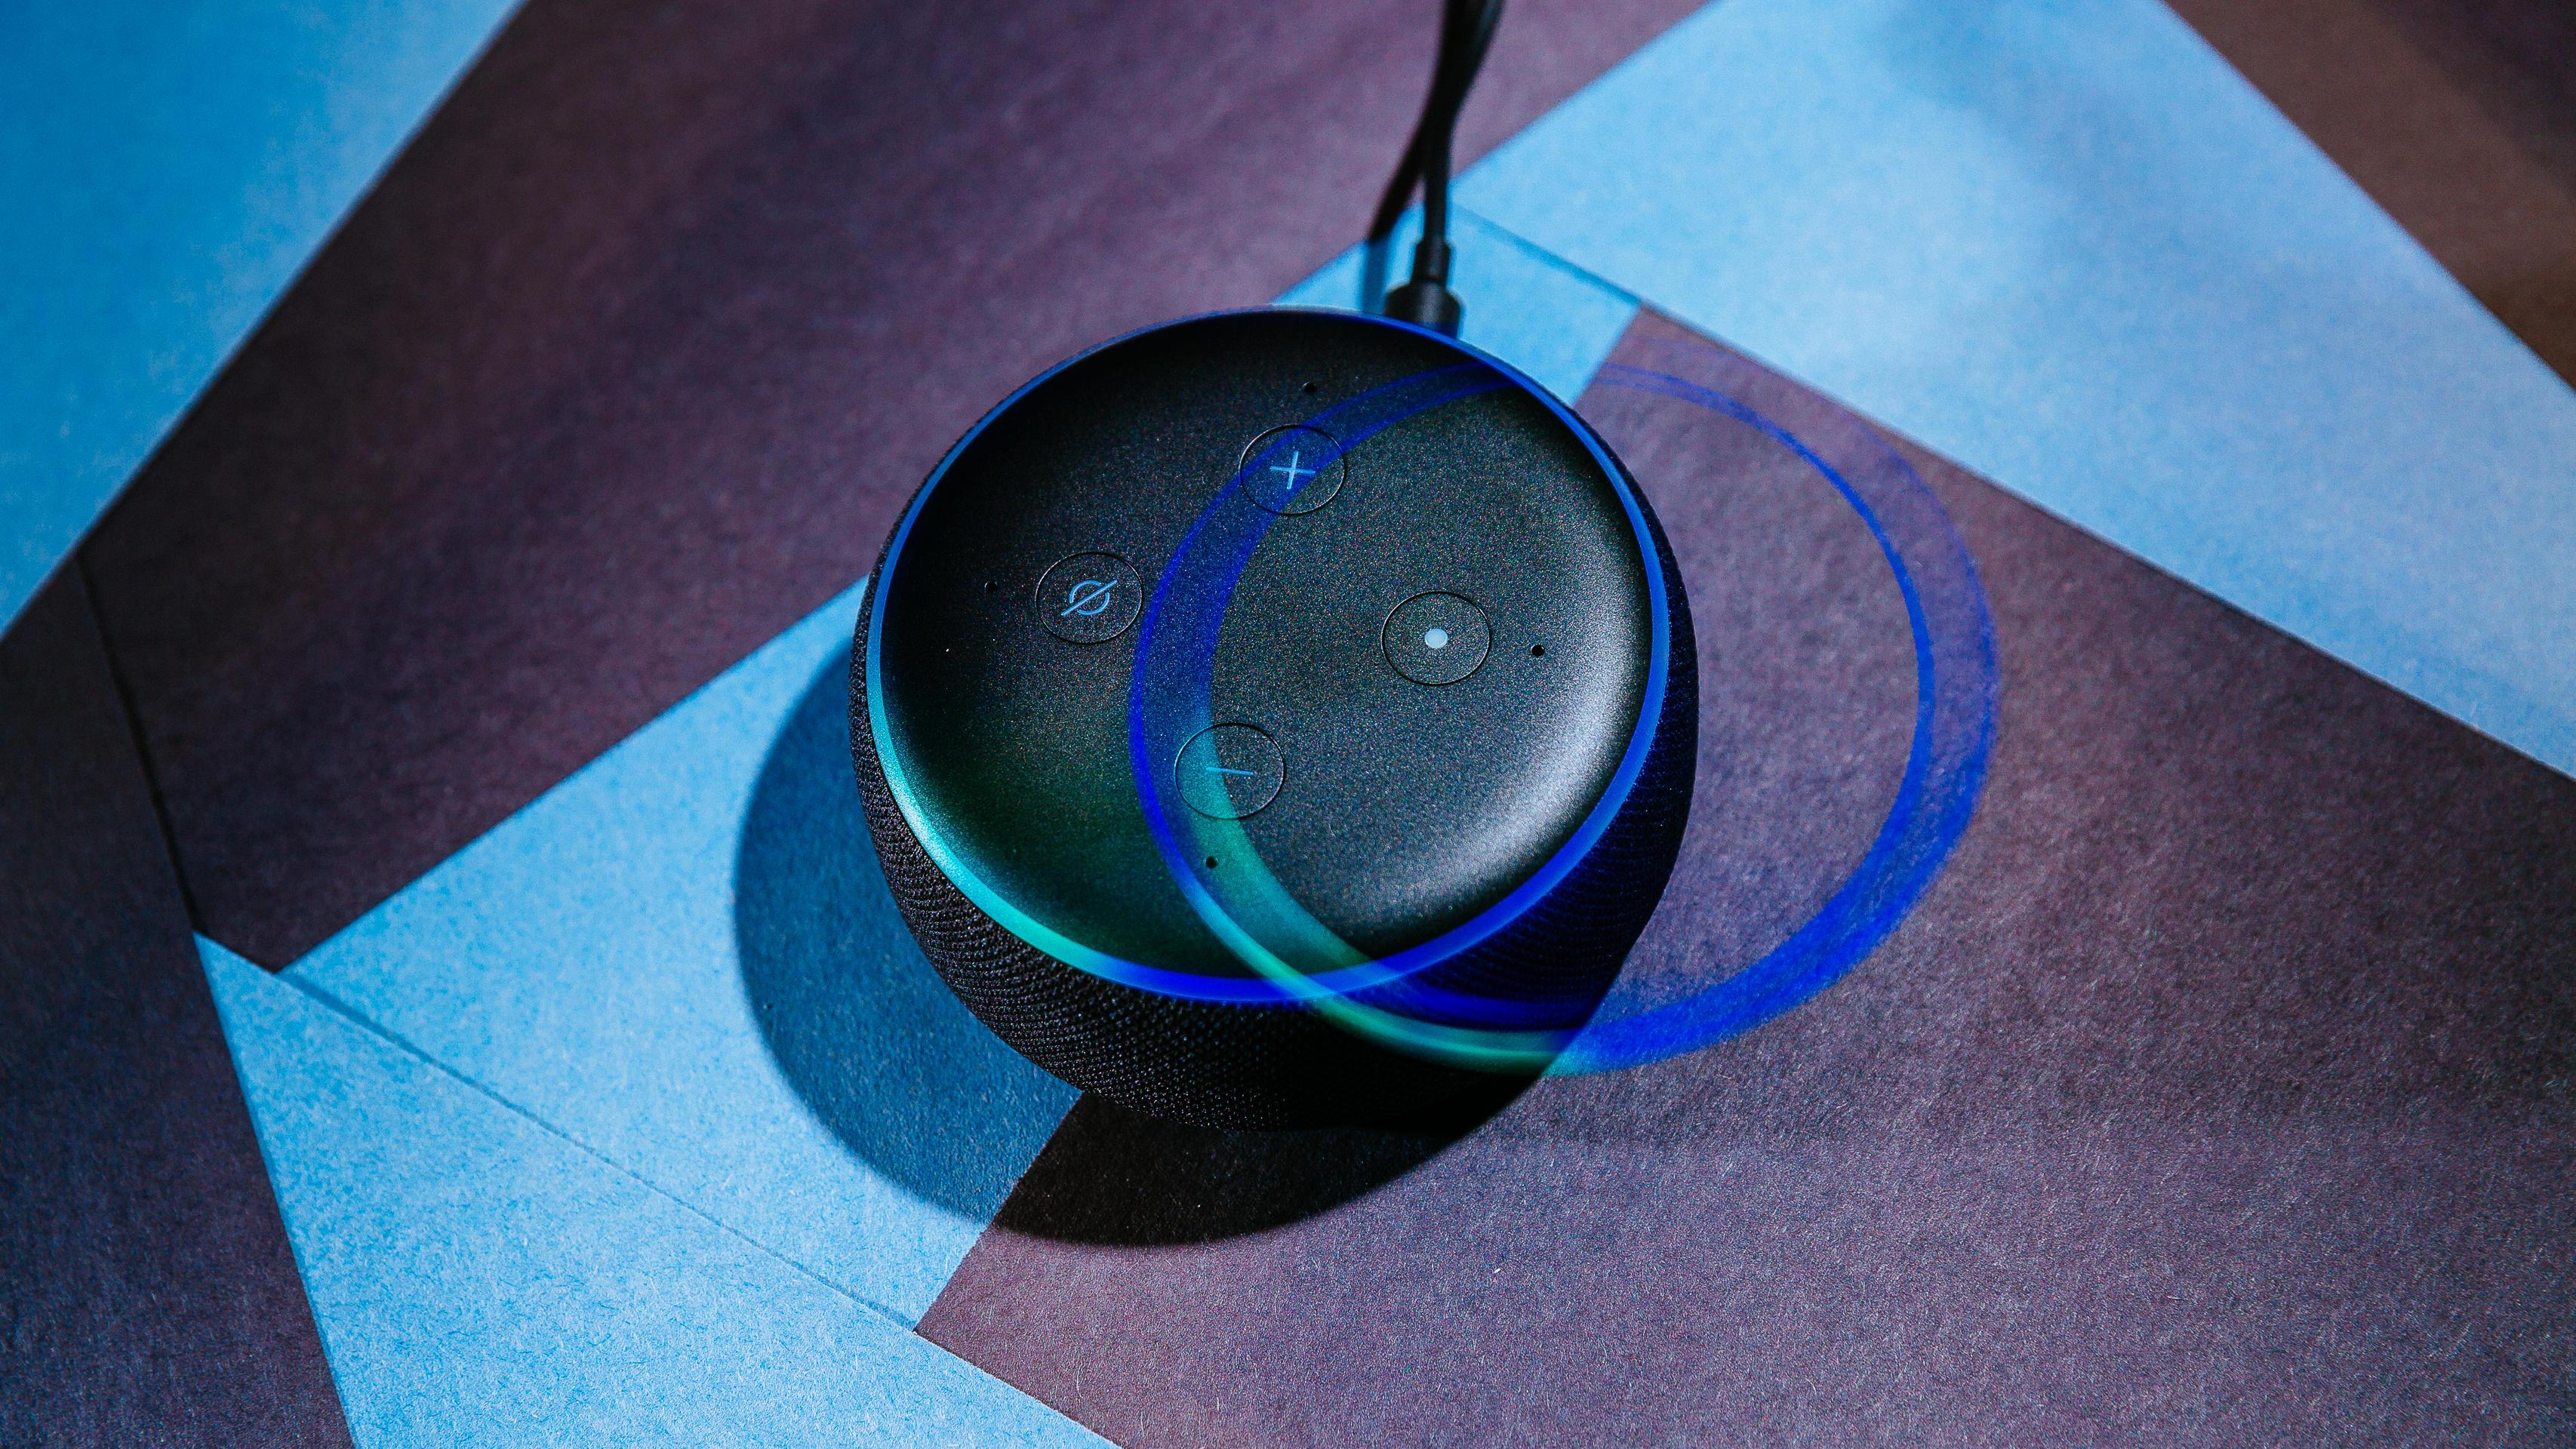 third-gen-amazon-echo-dot-product-photos-2